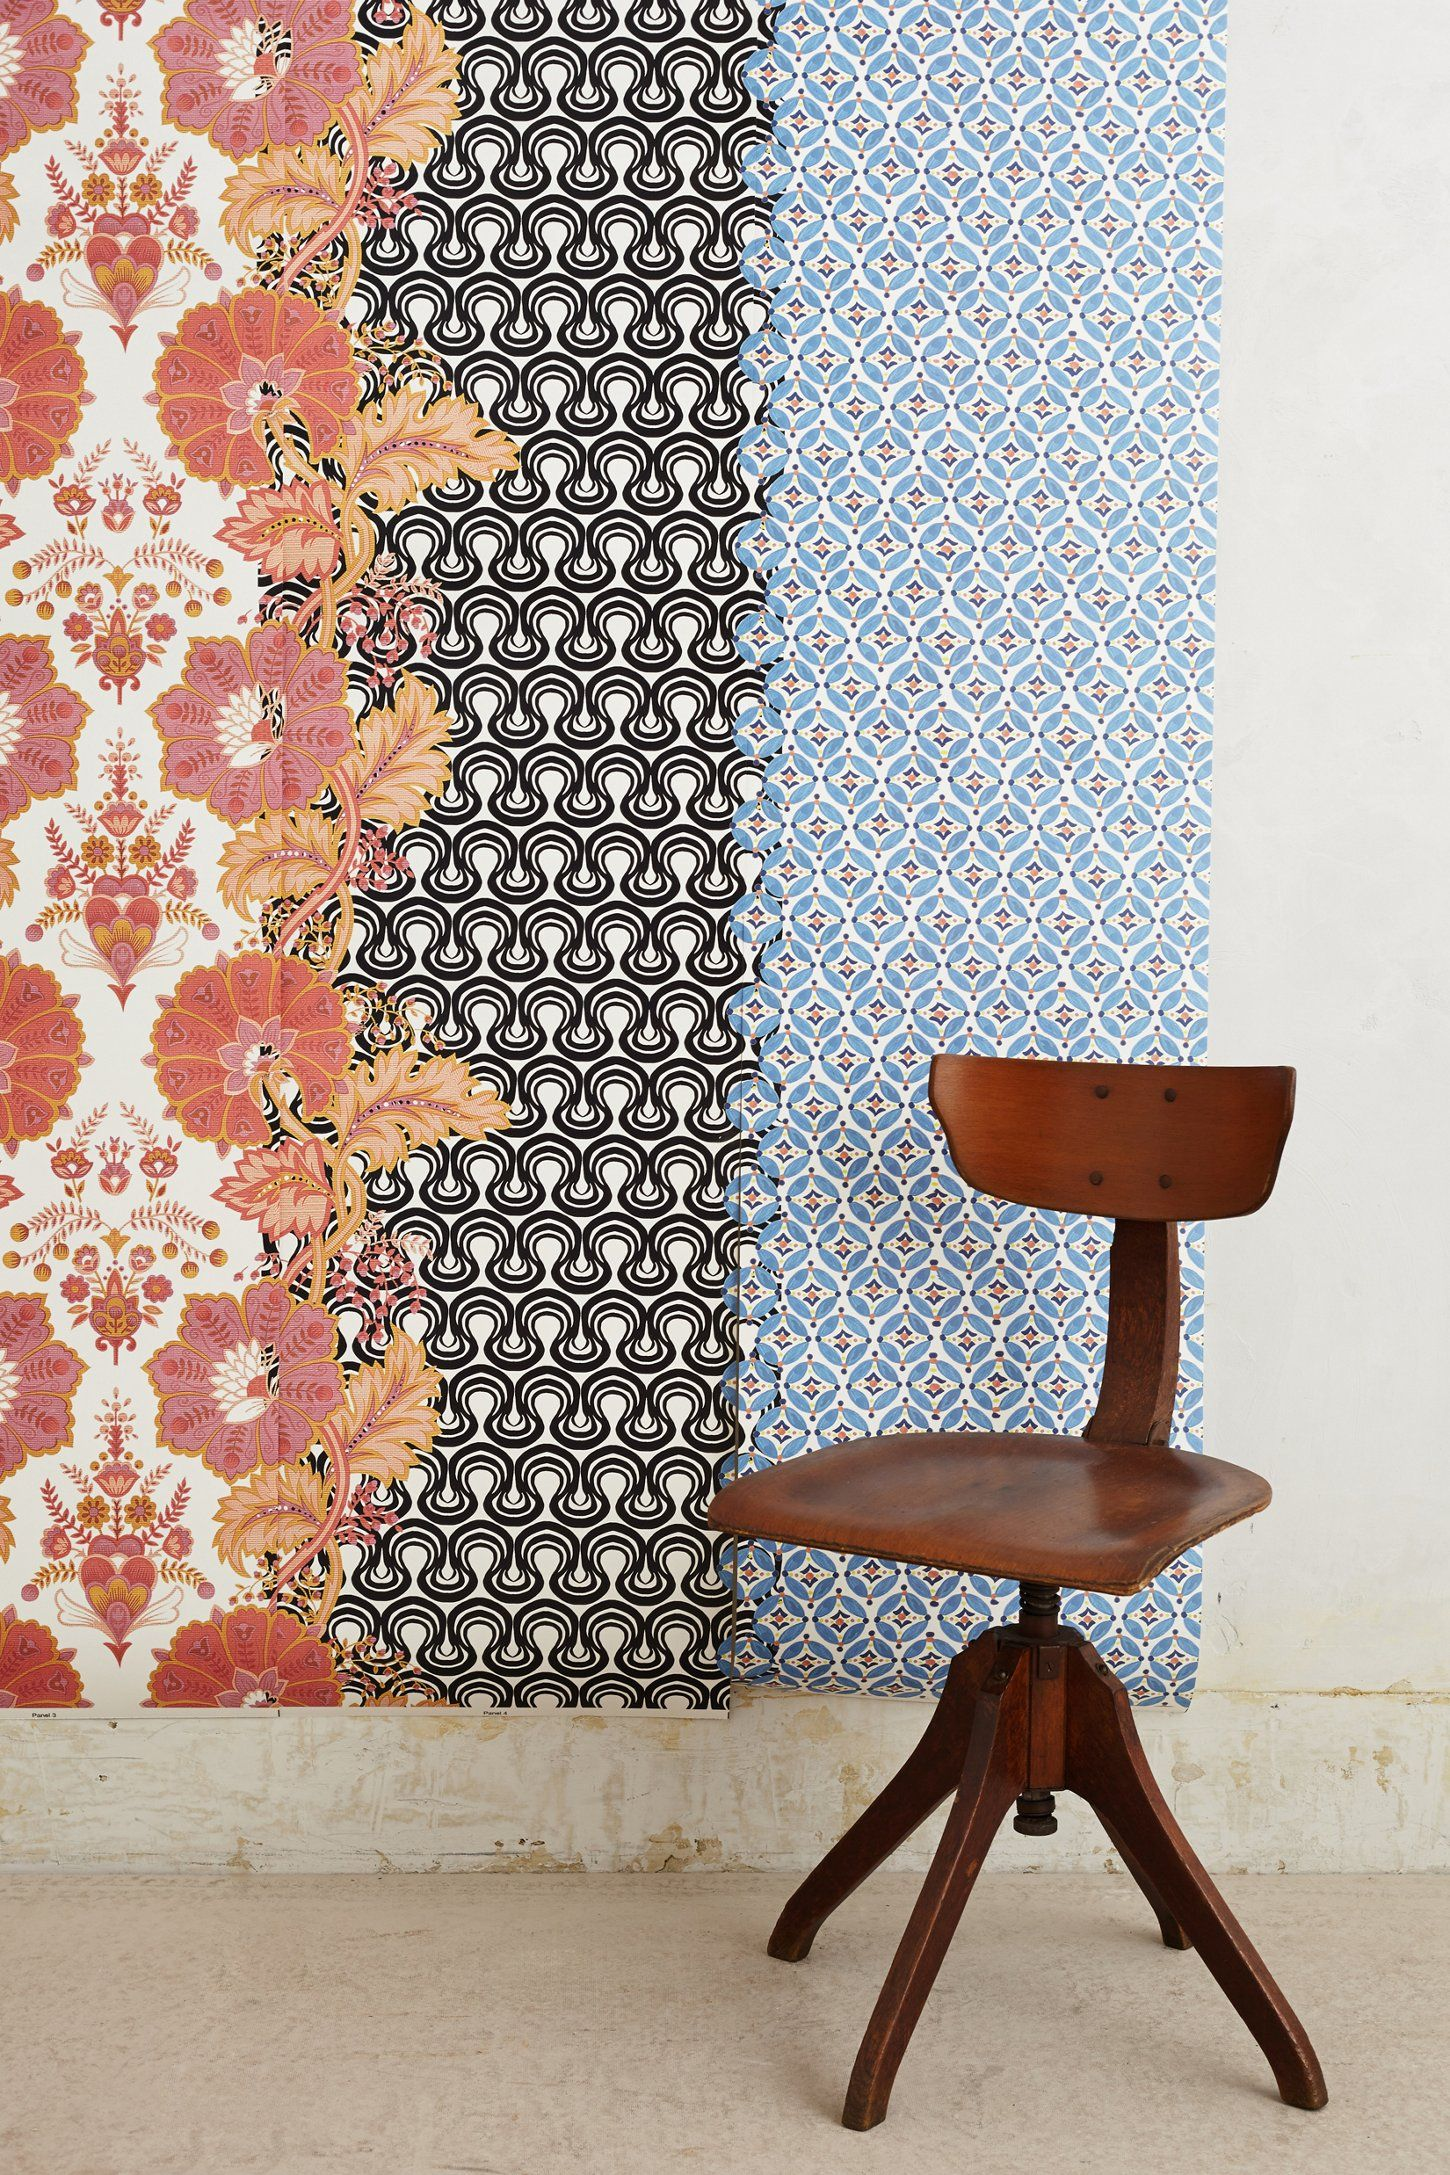 As a headboard? Textile Collage Mural